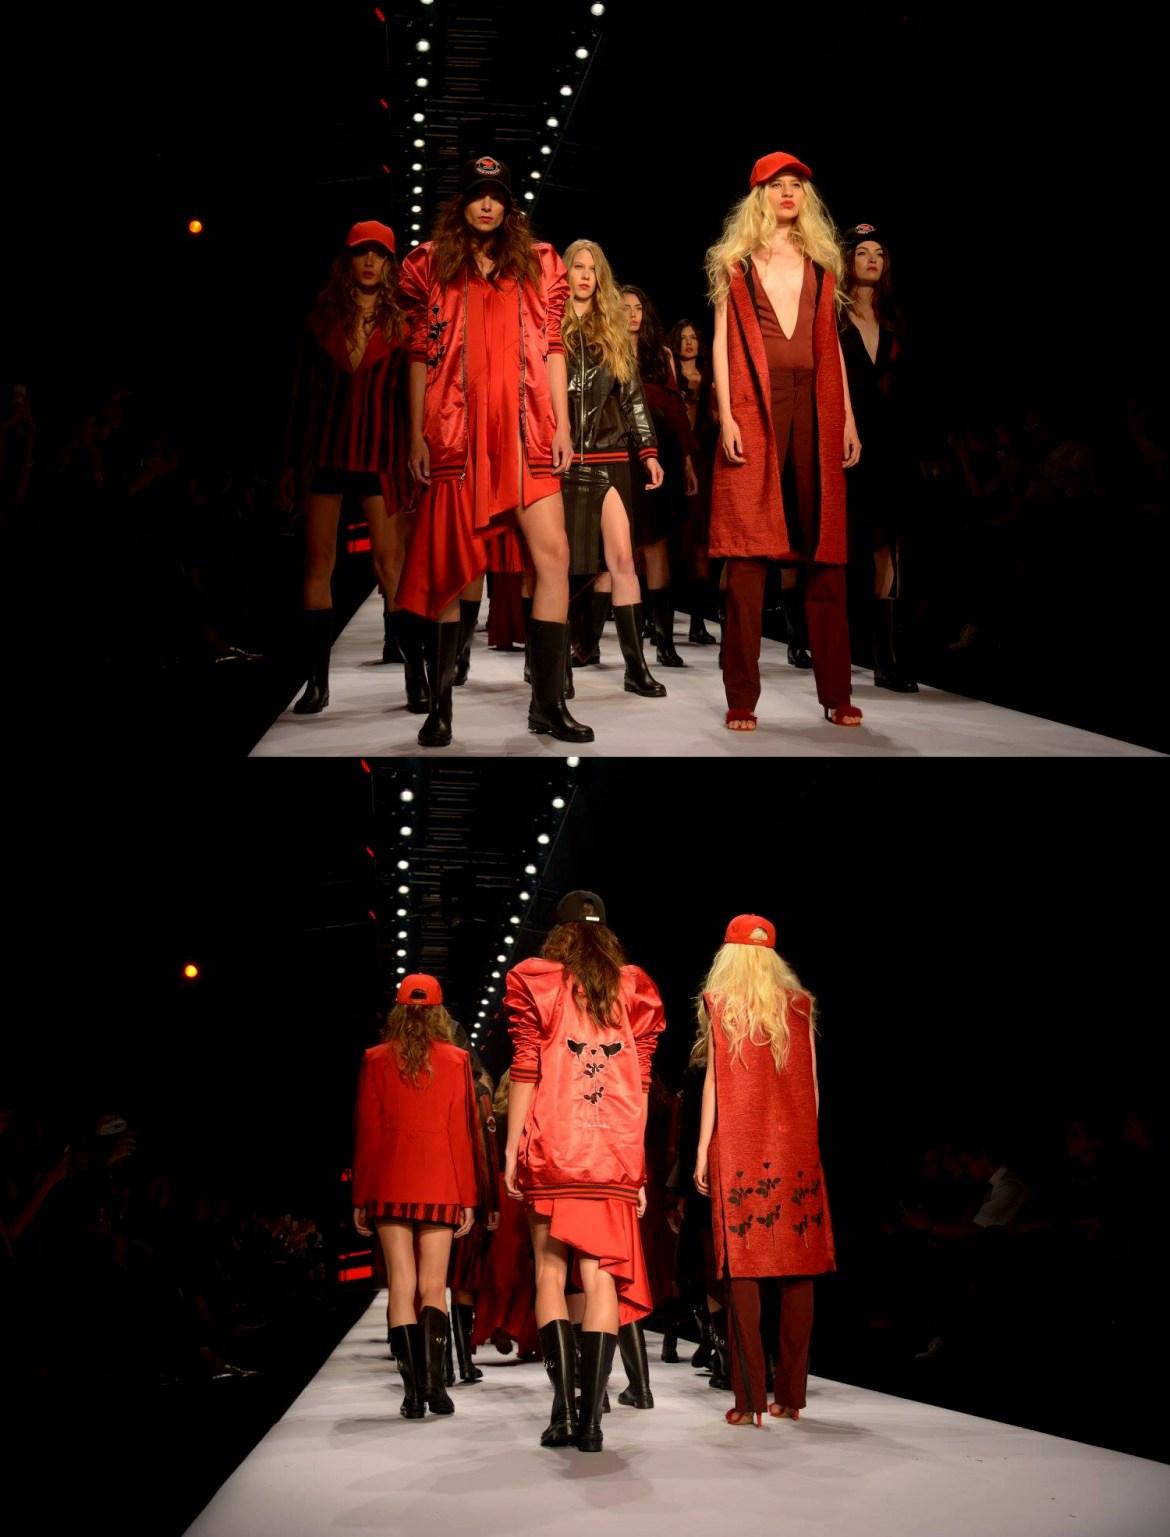 Isabel caviedes - blog de moda - danielastlying - bogota fashion week- 2106- fashion week- fashion blog29